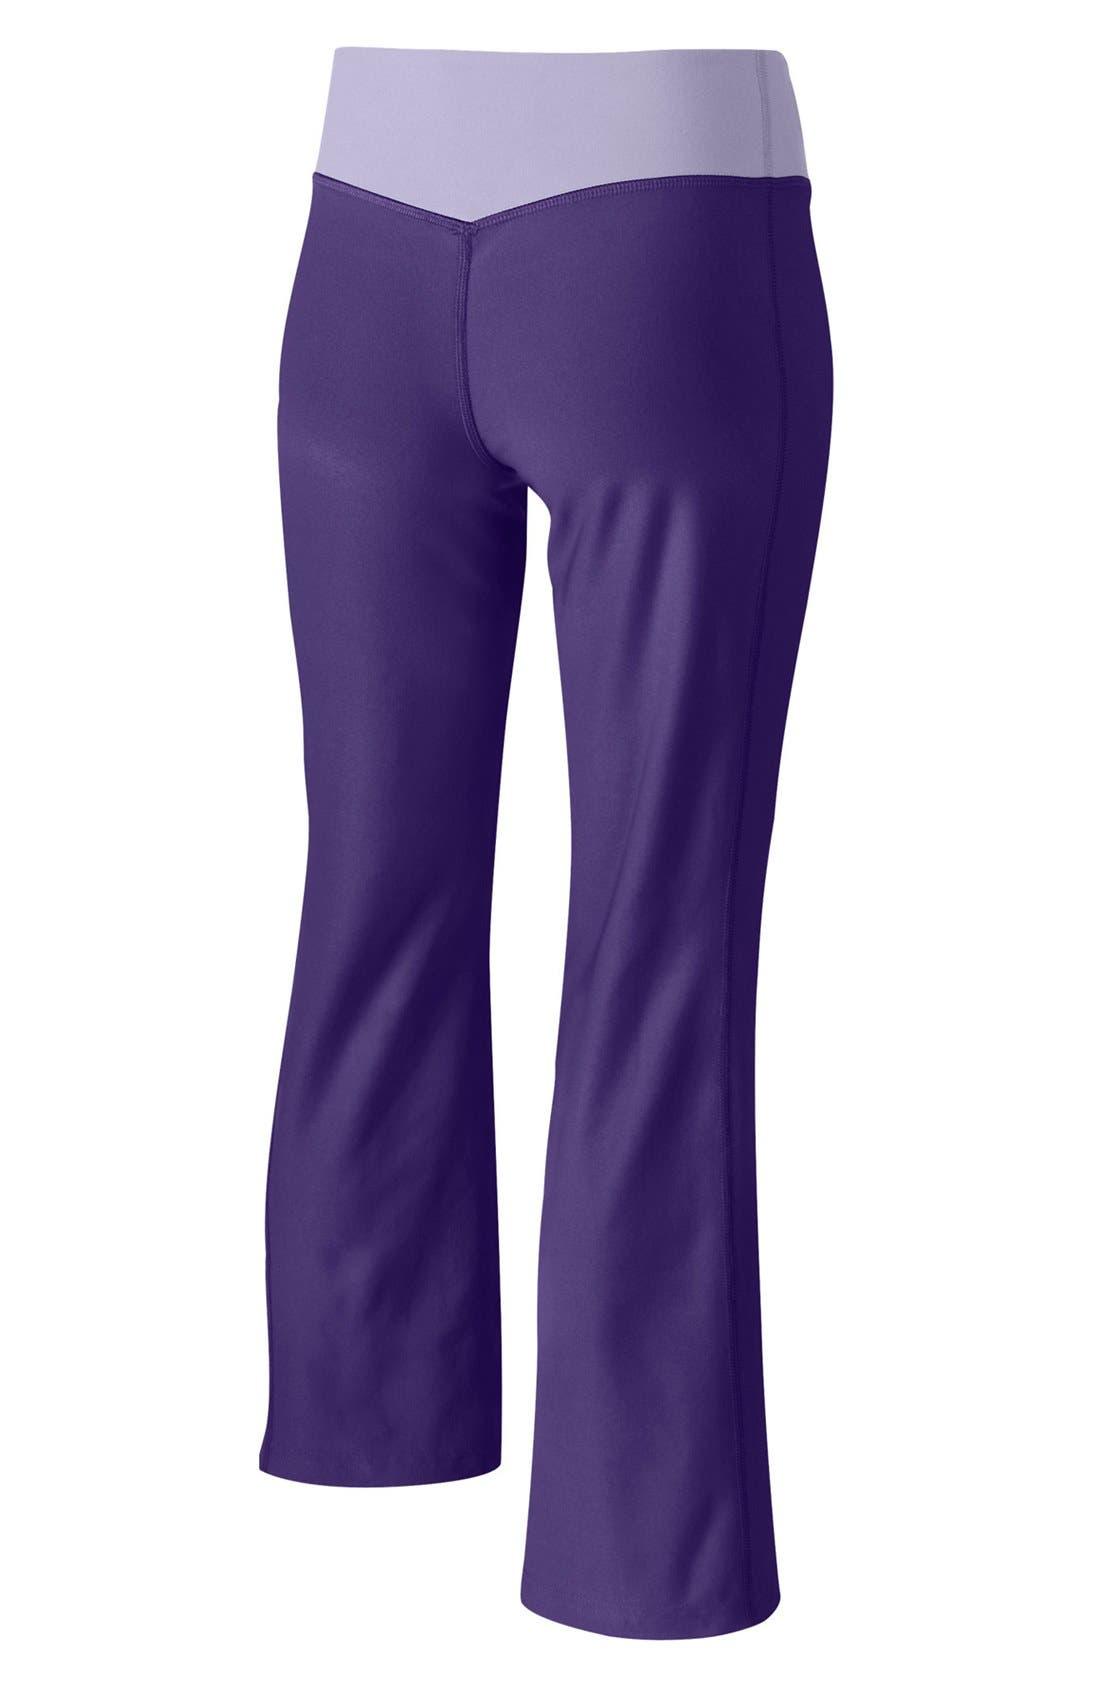 Alternate Image 2  - Nike 'Legend' Pants (Big Girls)